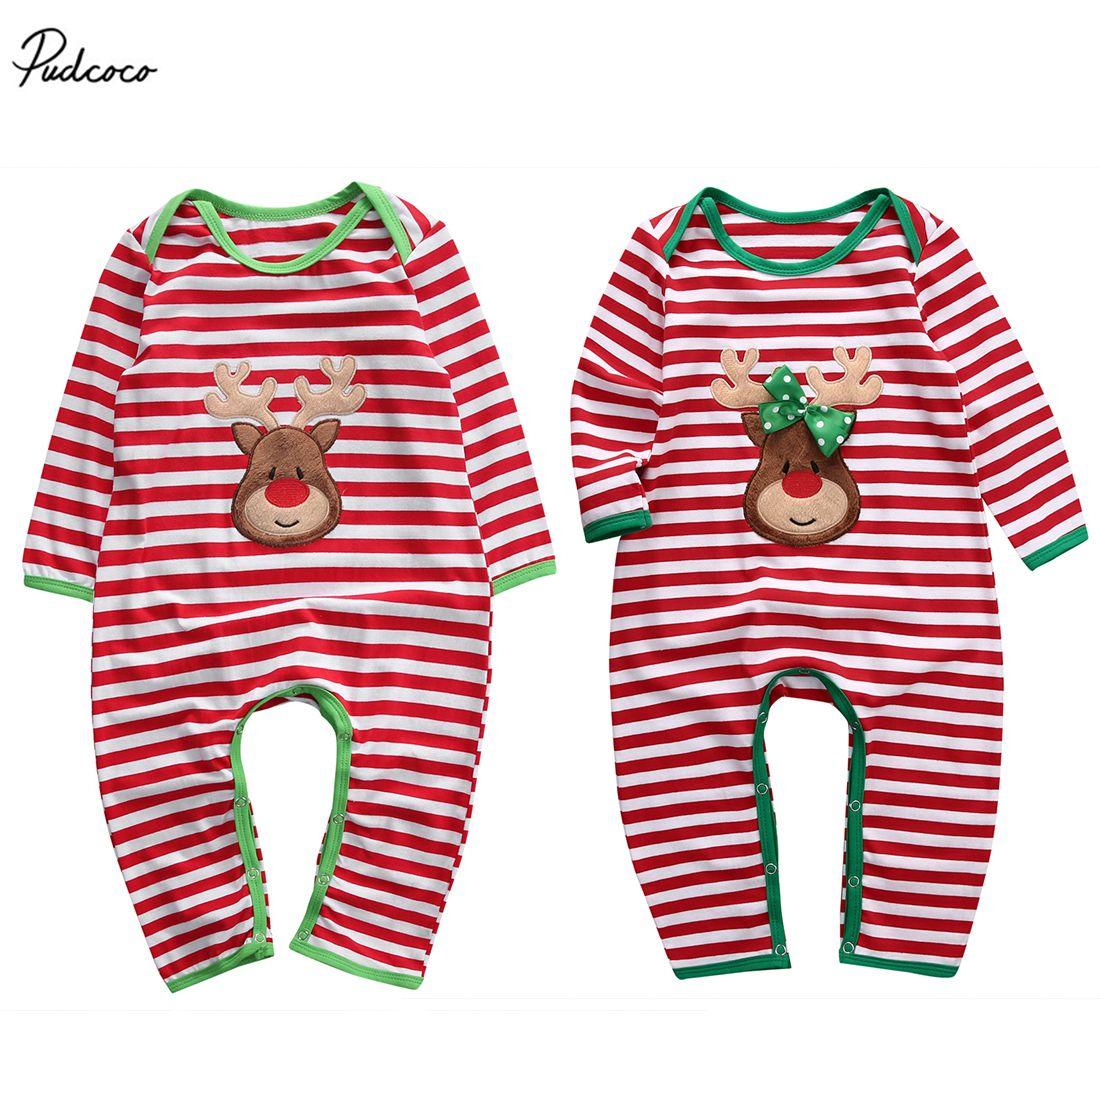 Pudcoco Christmas 3D Deer Romper Newborn Infant Baby Boys Girls 2017 New Striped Long Sleeve Sleepwear Pajamas Nightwear S200107